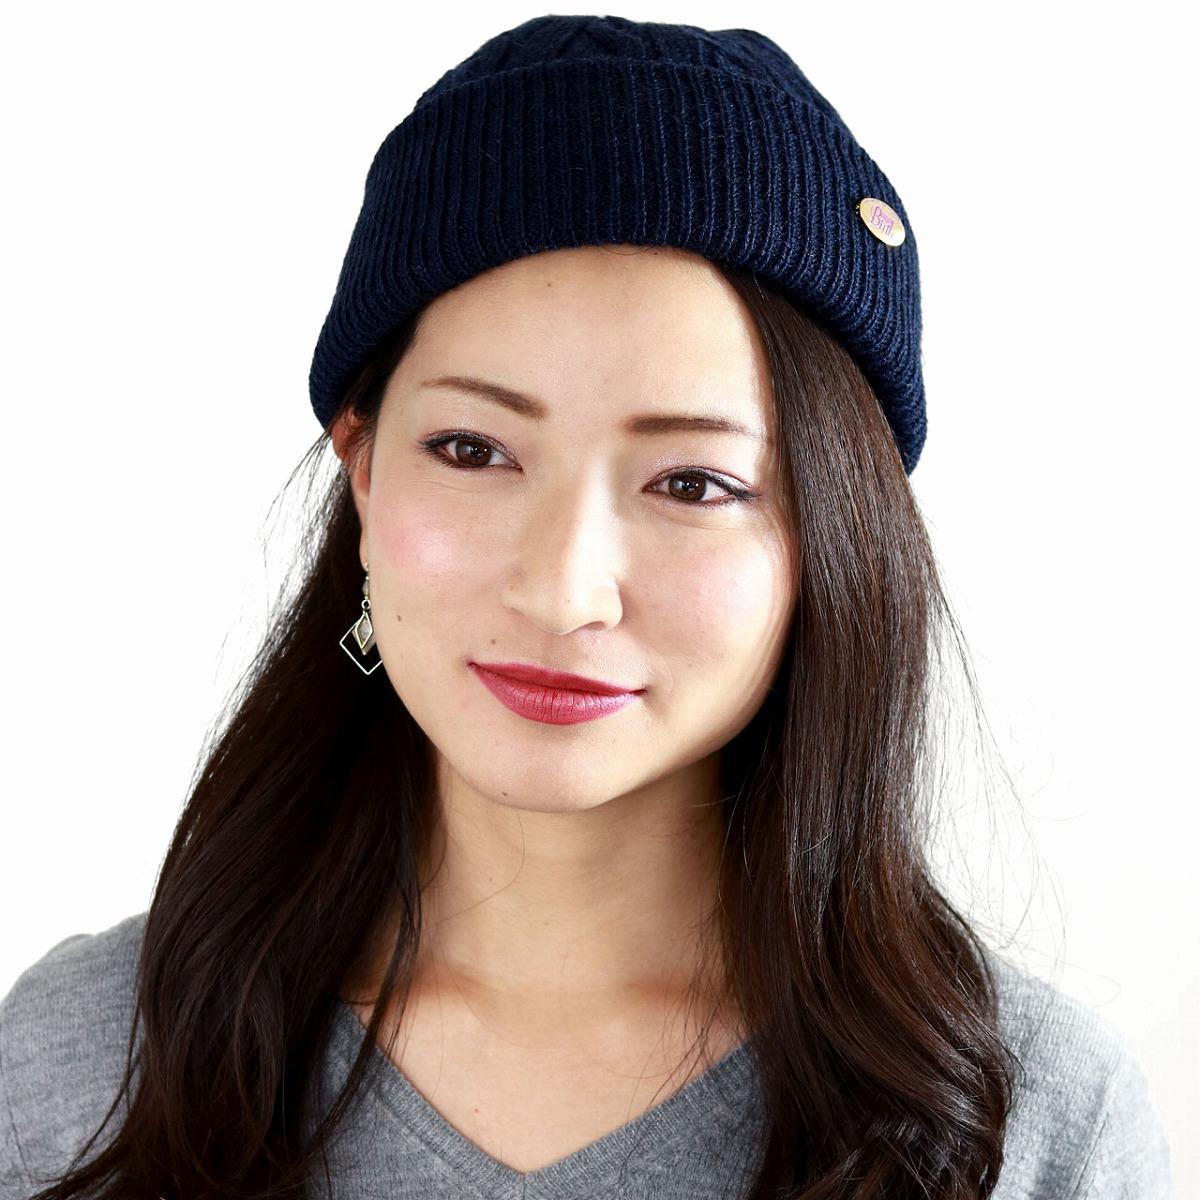 caf965ae Merino wool knit hat men cable knitting MAISON Birth lapel ニットワッチ hat knit  hat Lady's knit wool / dark blue navy [beanie cap] present man ...